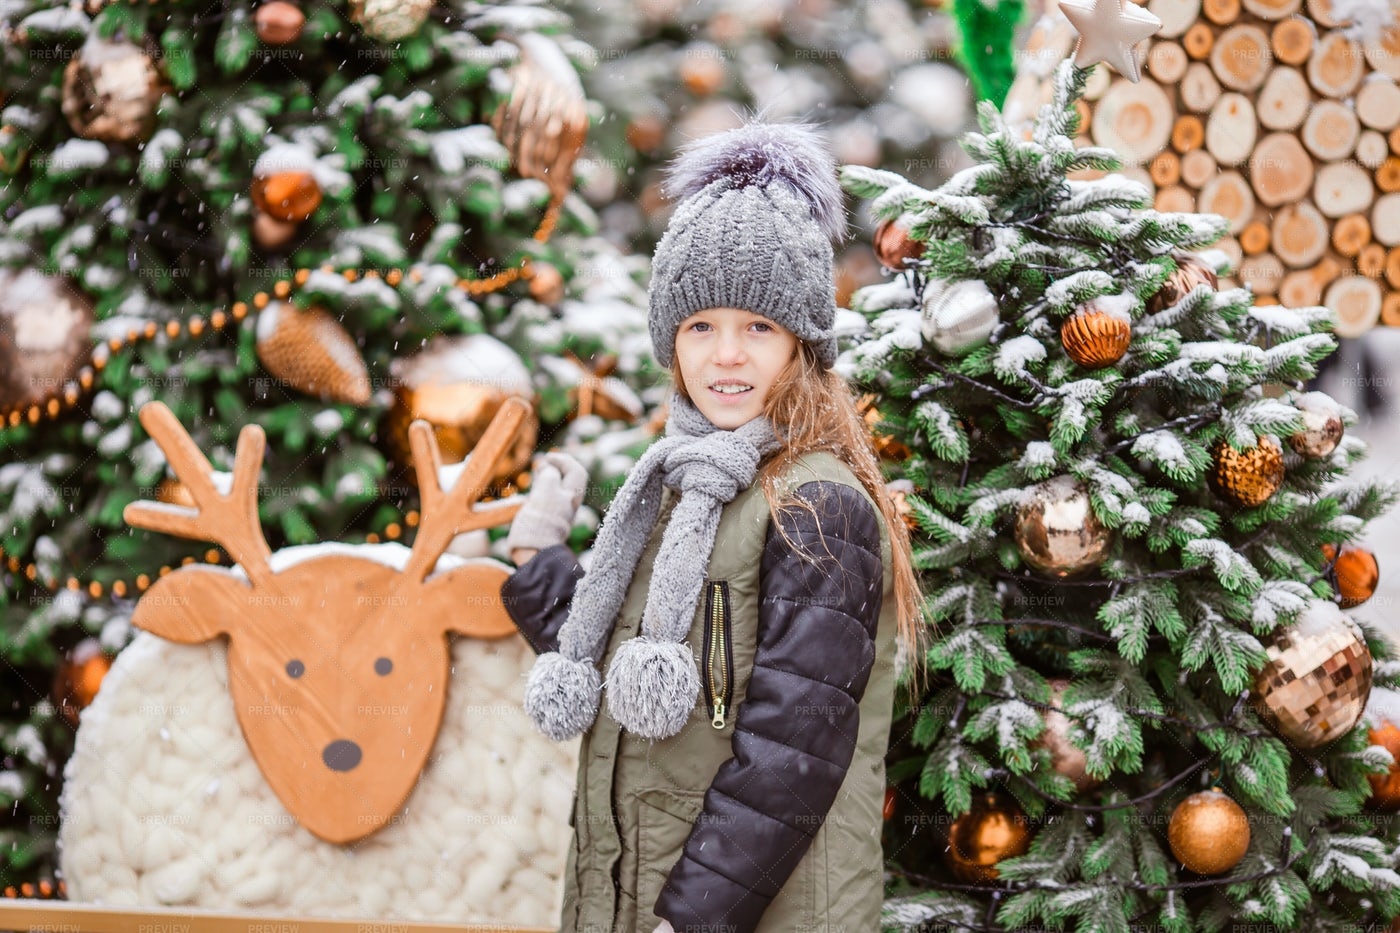 Child Beside Christmas Decorations: Stock Photos